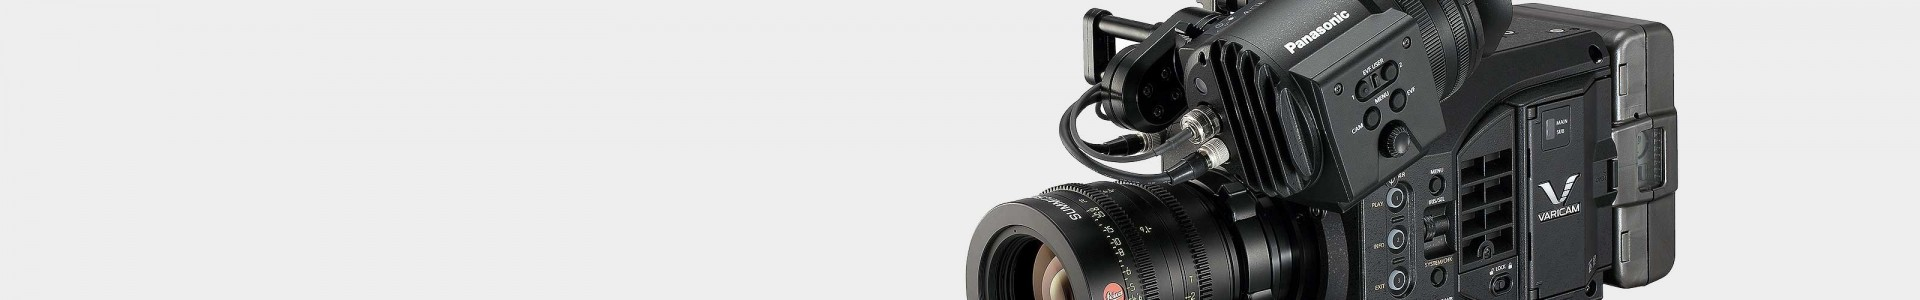 Cámaras de Cine Digital Panasonic - Avacab Audiovisuales